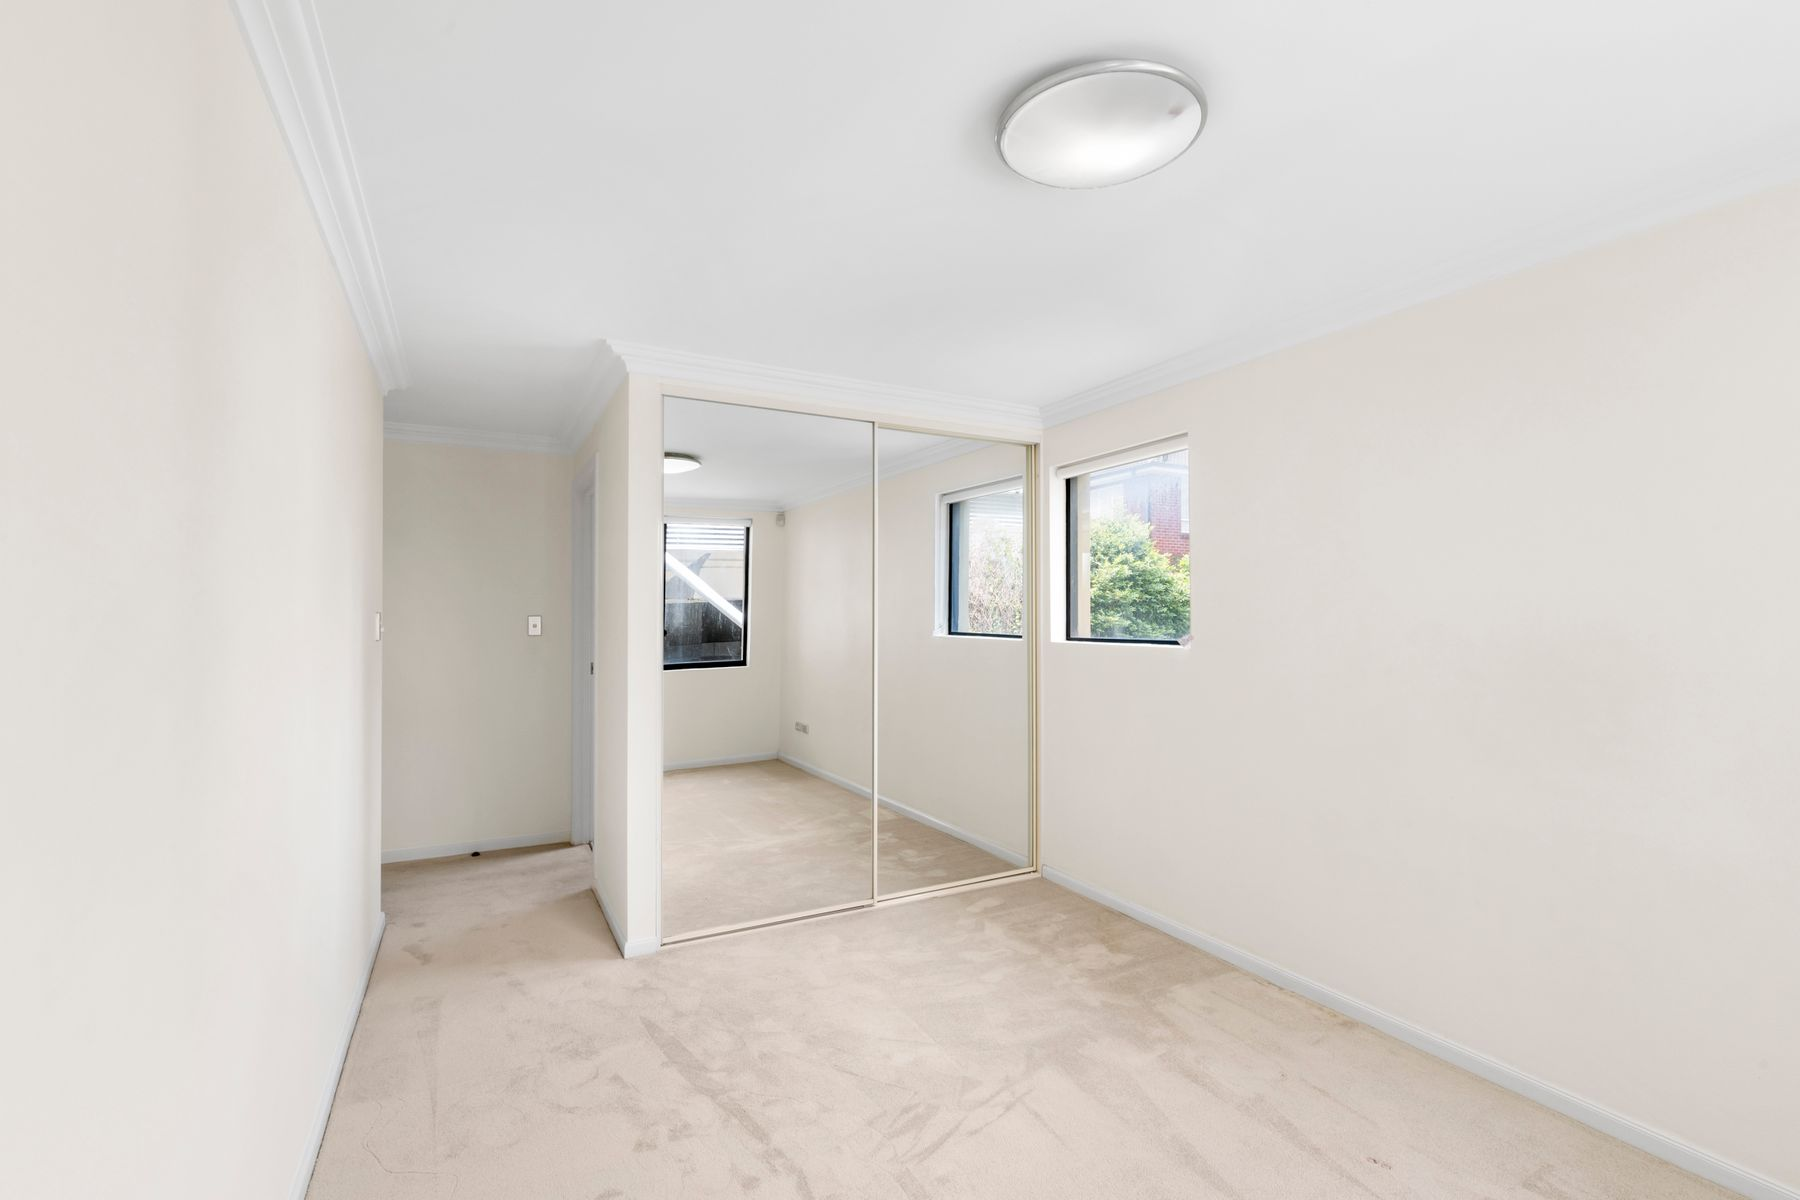 8/1-3 Havilah Street, Chatswood, NSW 2067